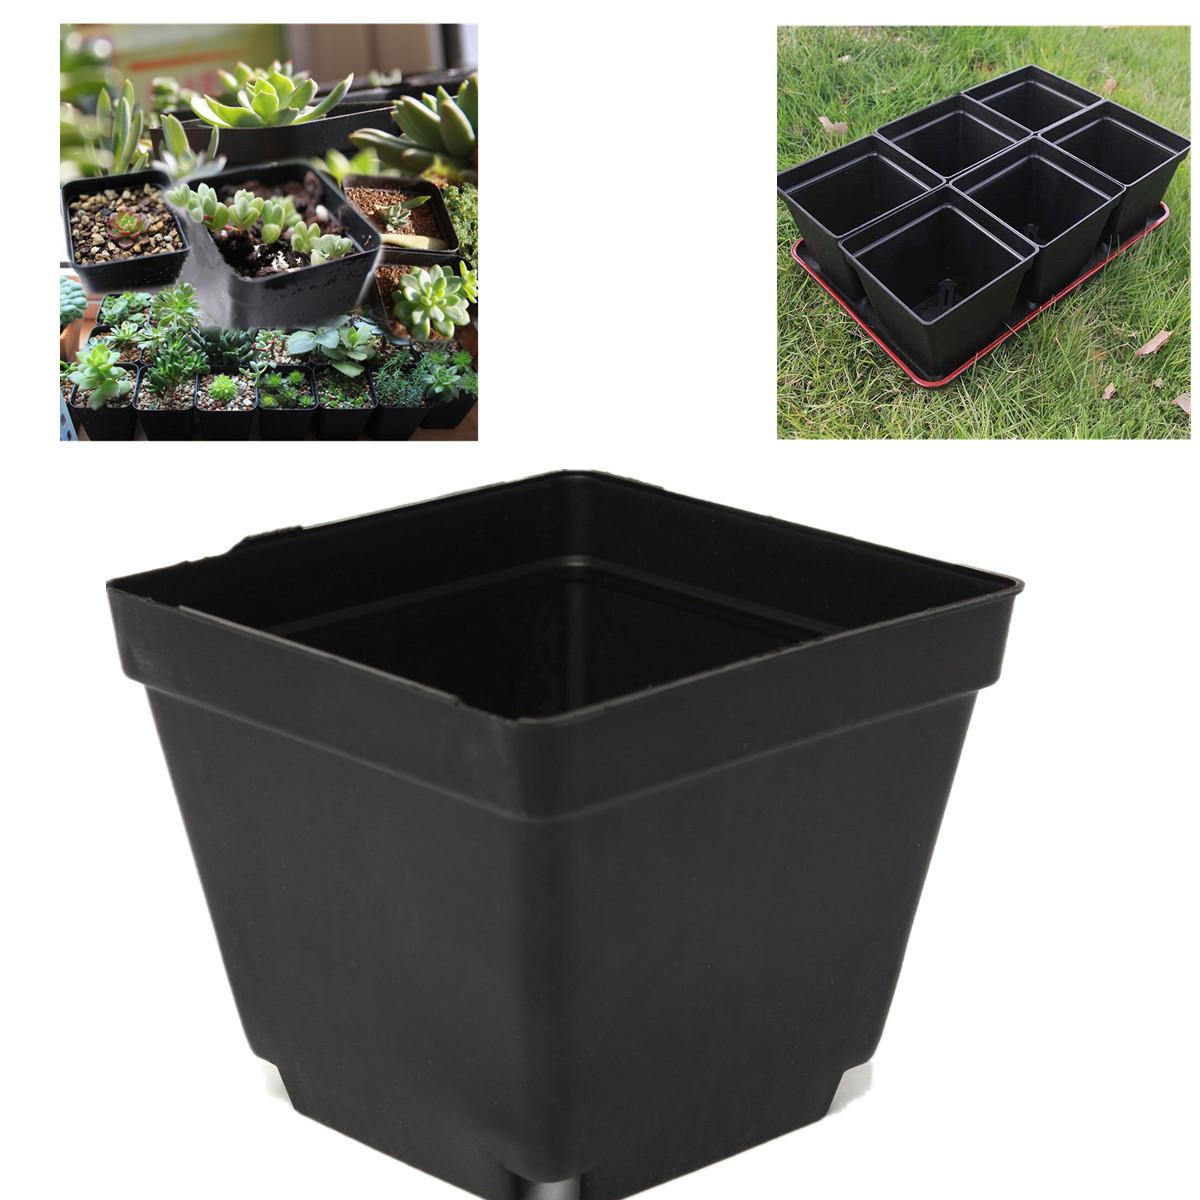 "3.5"" Inch Square Black Plastic Nursery Pots Seedlings ..."